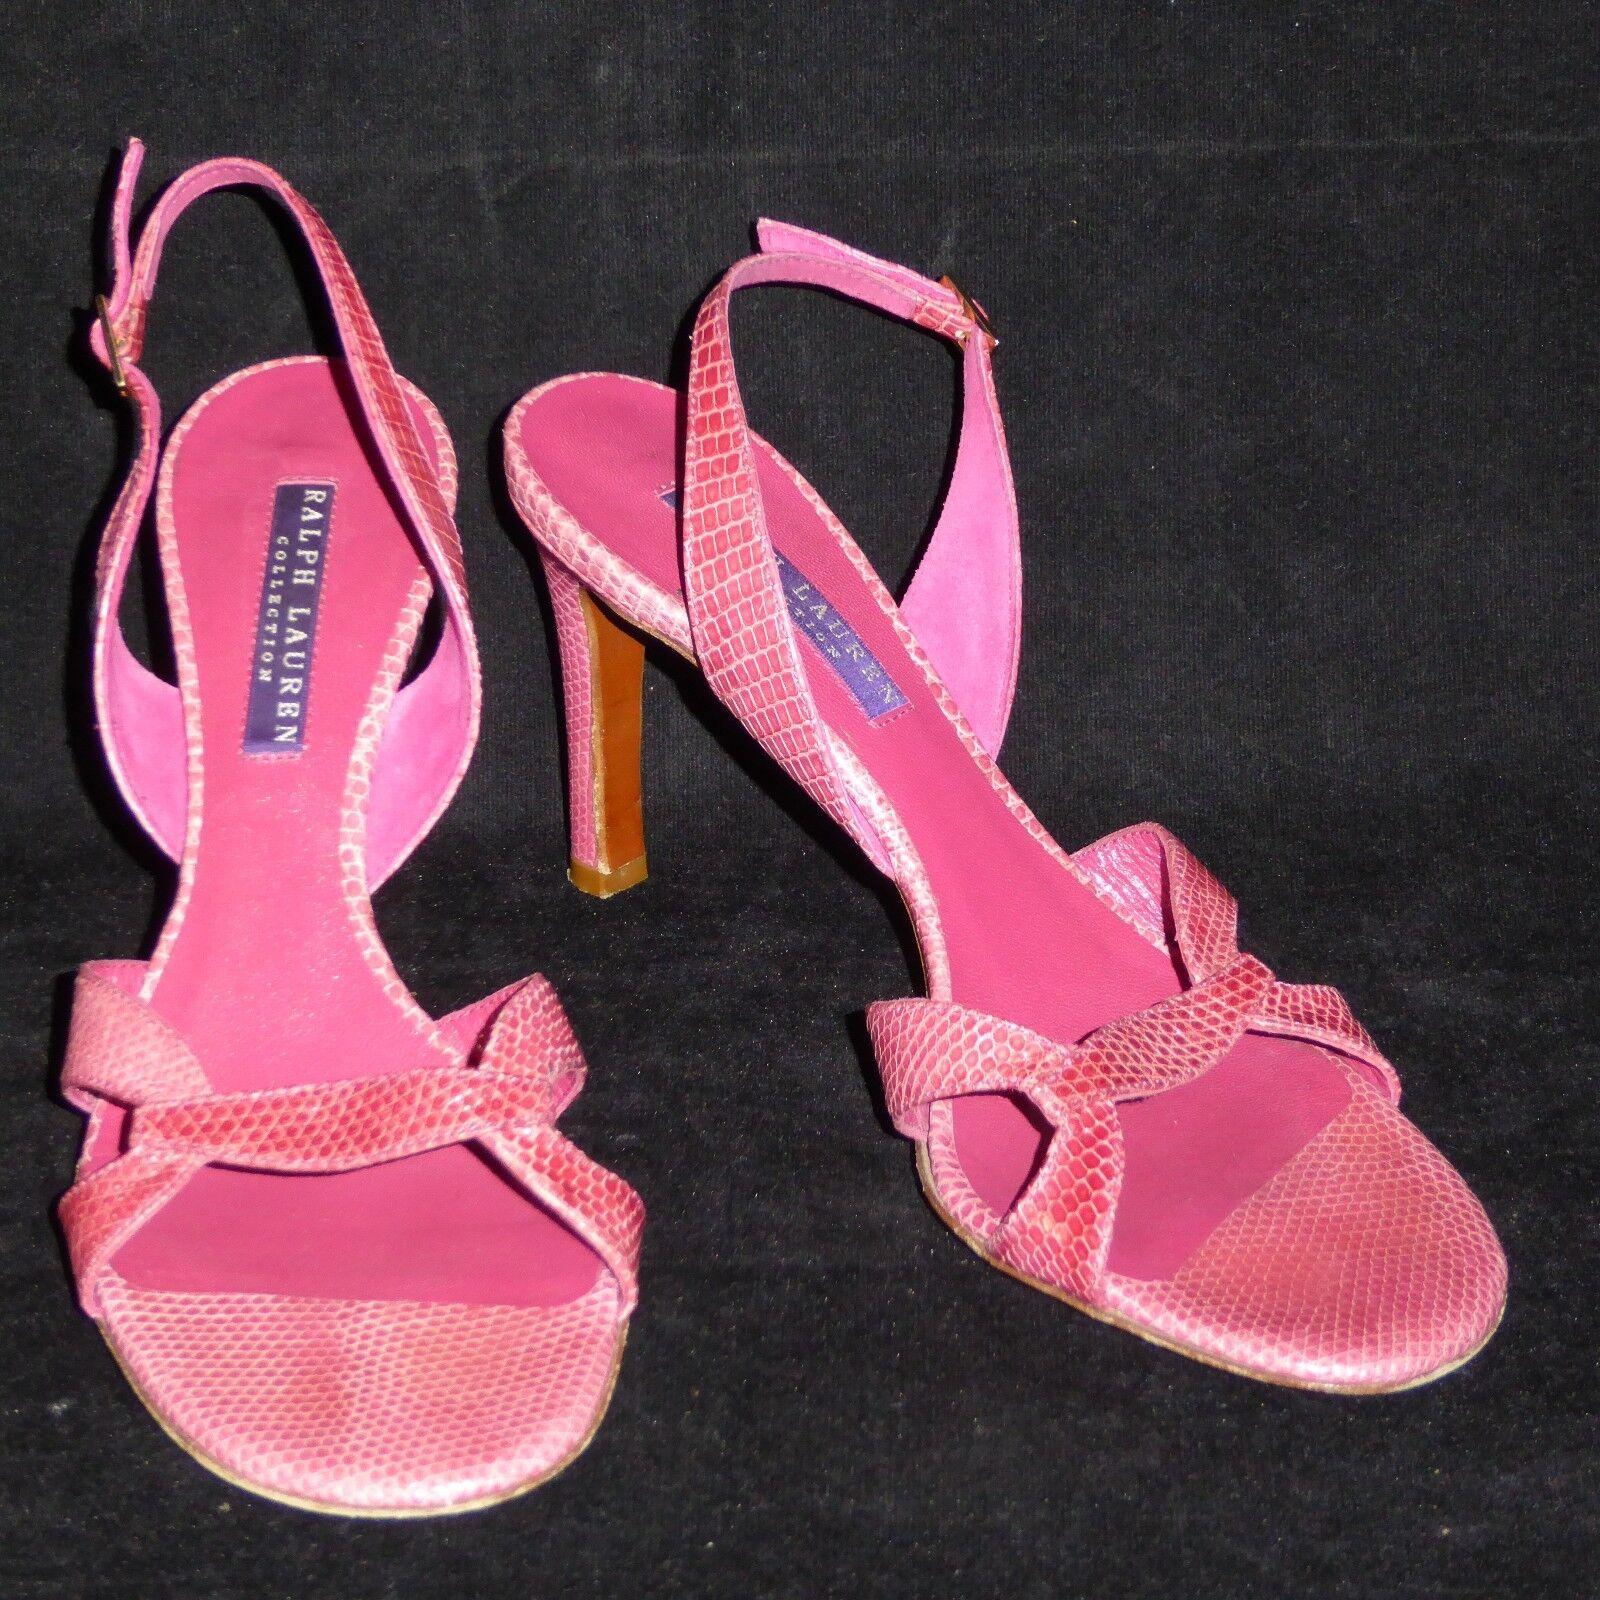 Ralph Lauren Collection violet Label  3 1 2 High Heel rose Pumps chaussures 7 B